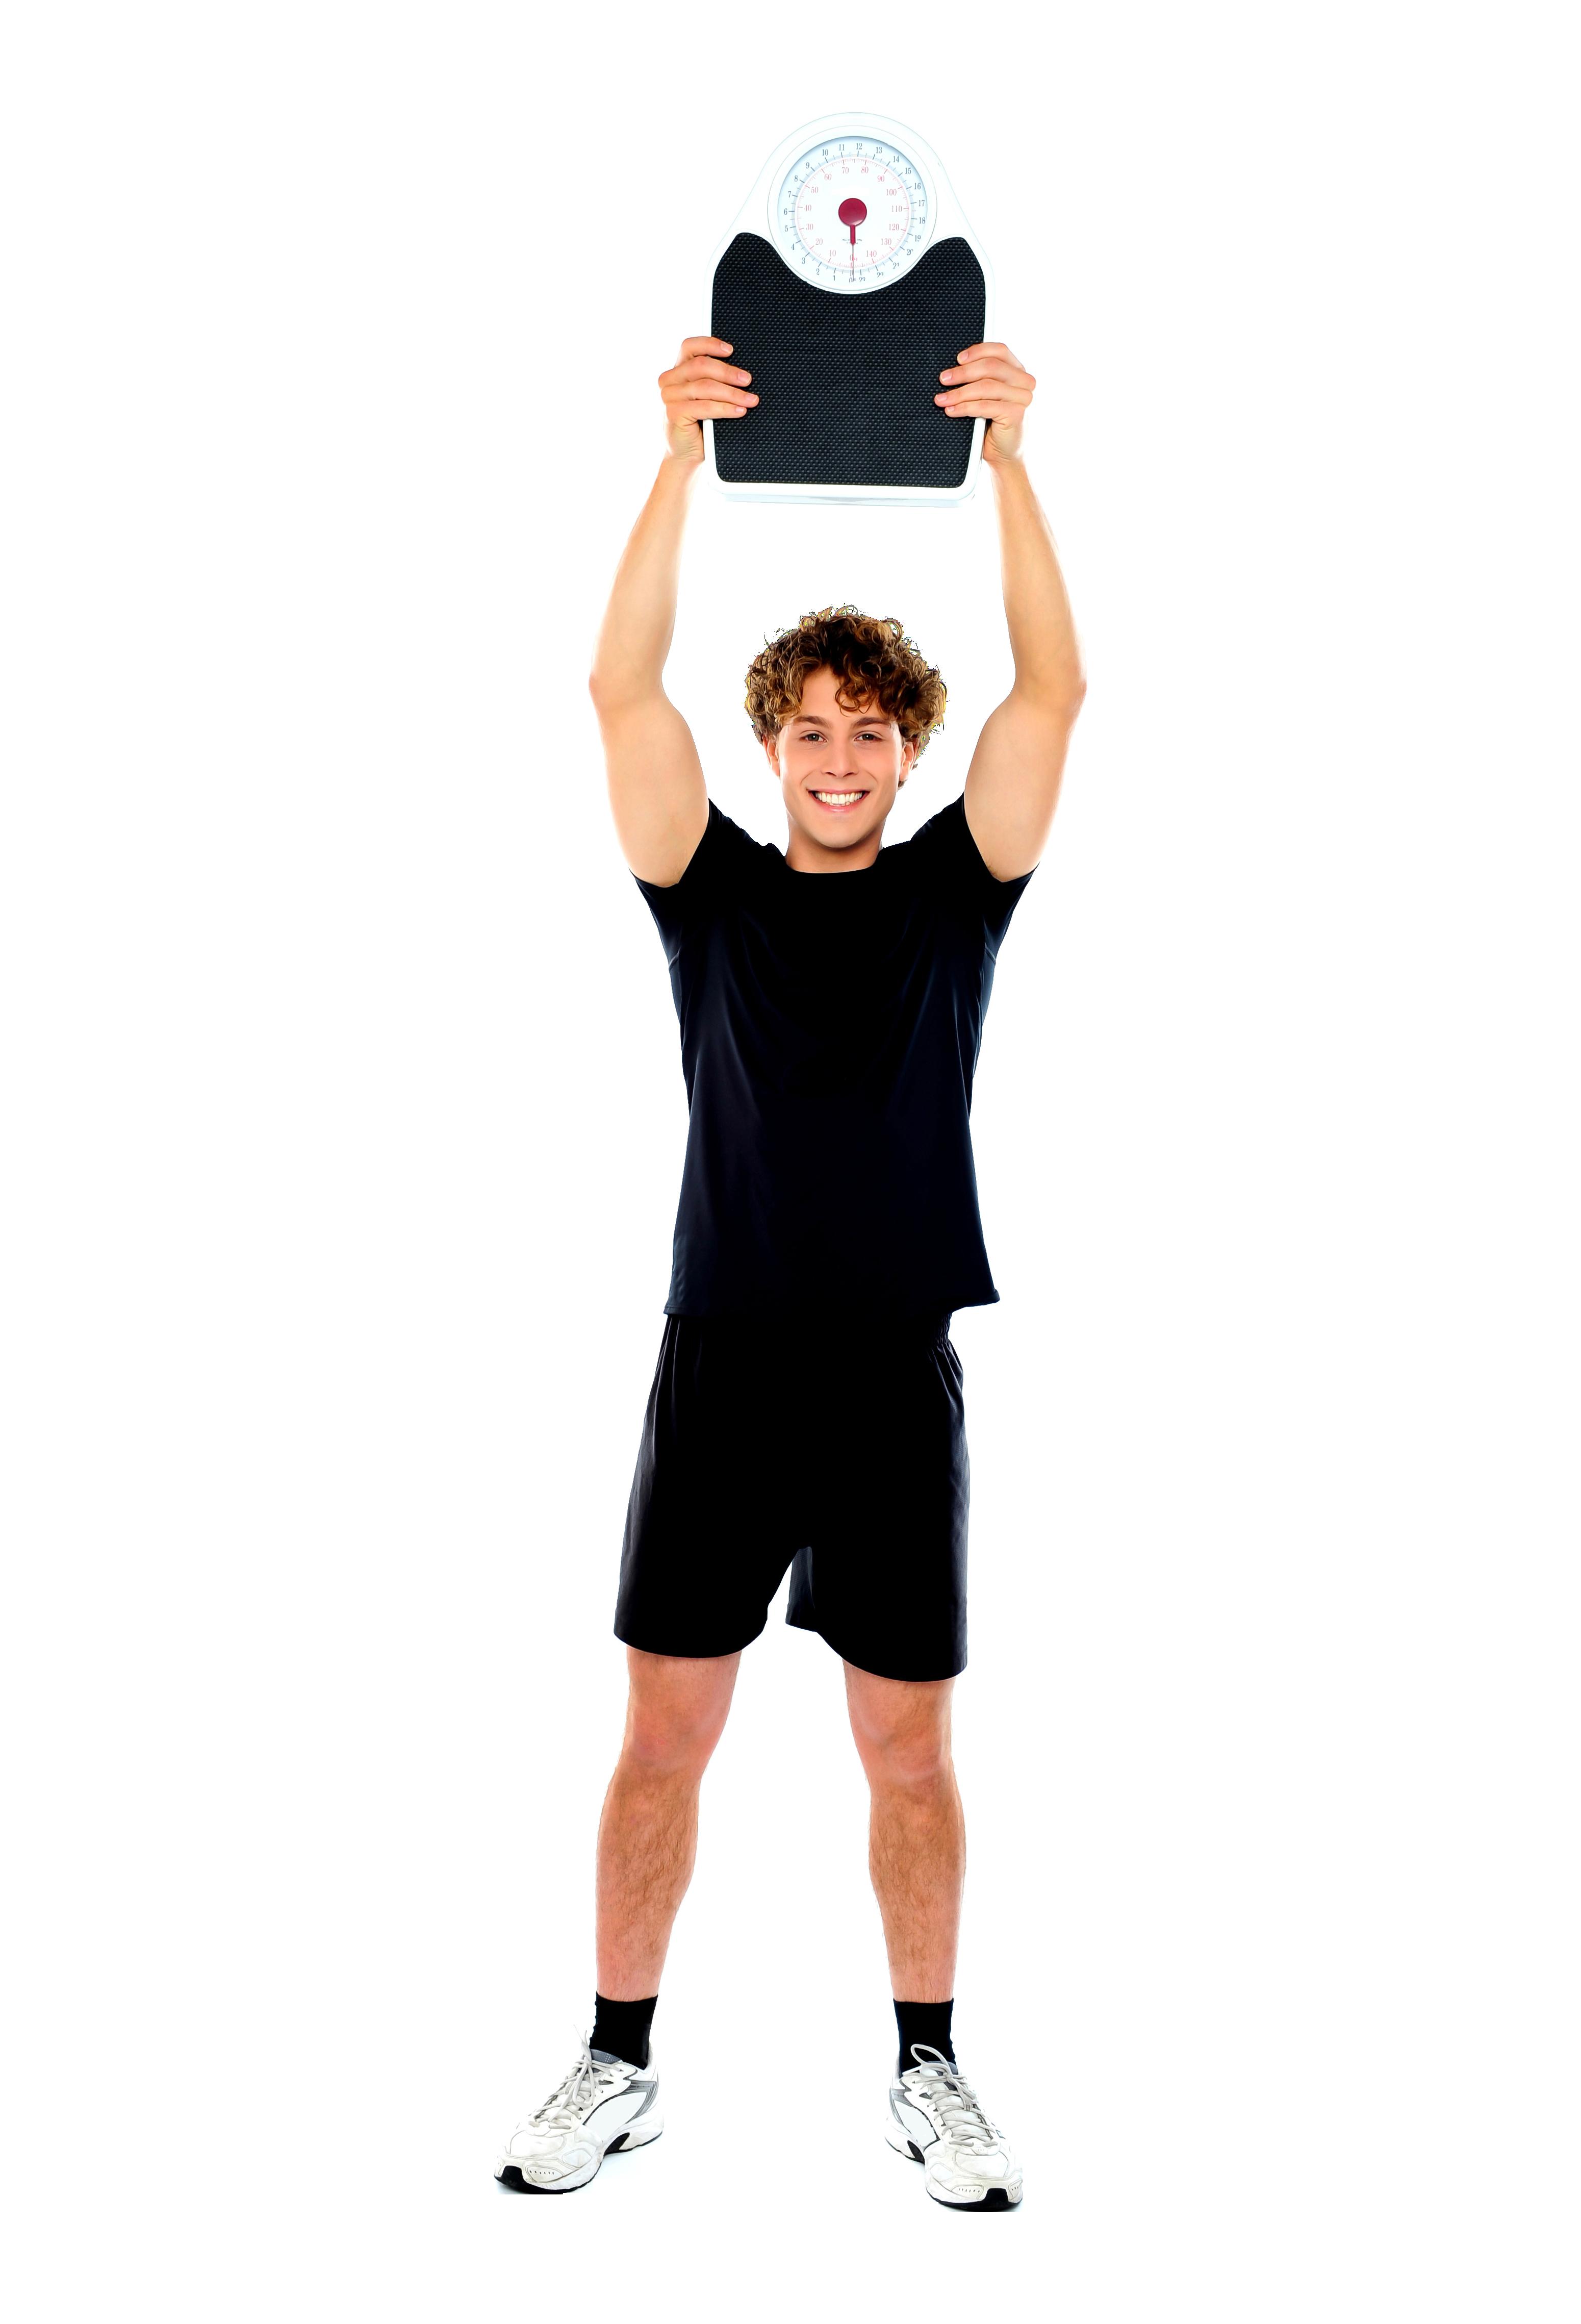 Dumbbell clipart women's fitness. Men png image purepng